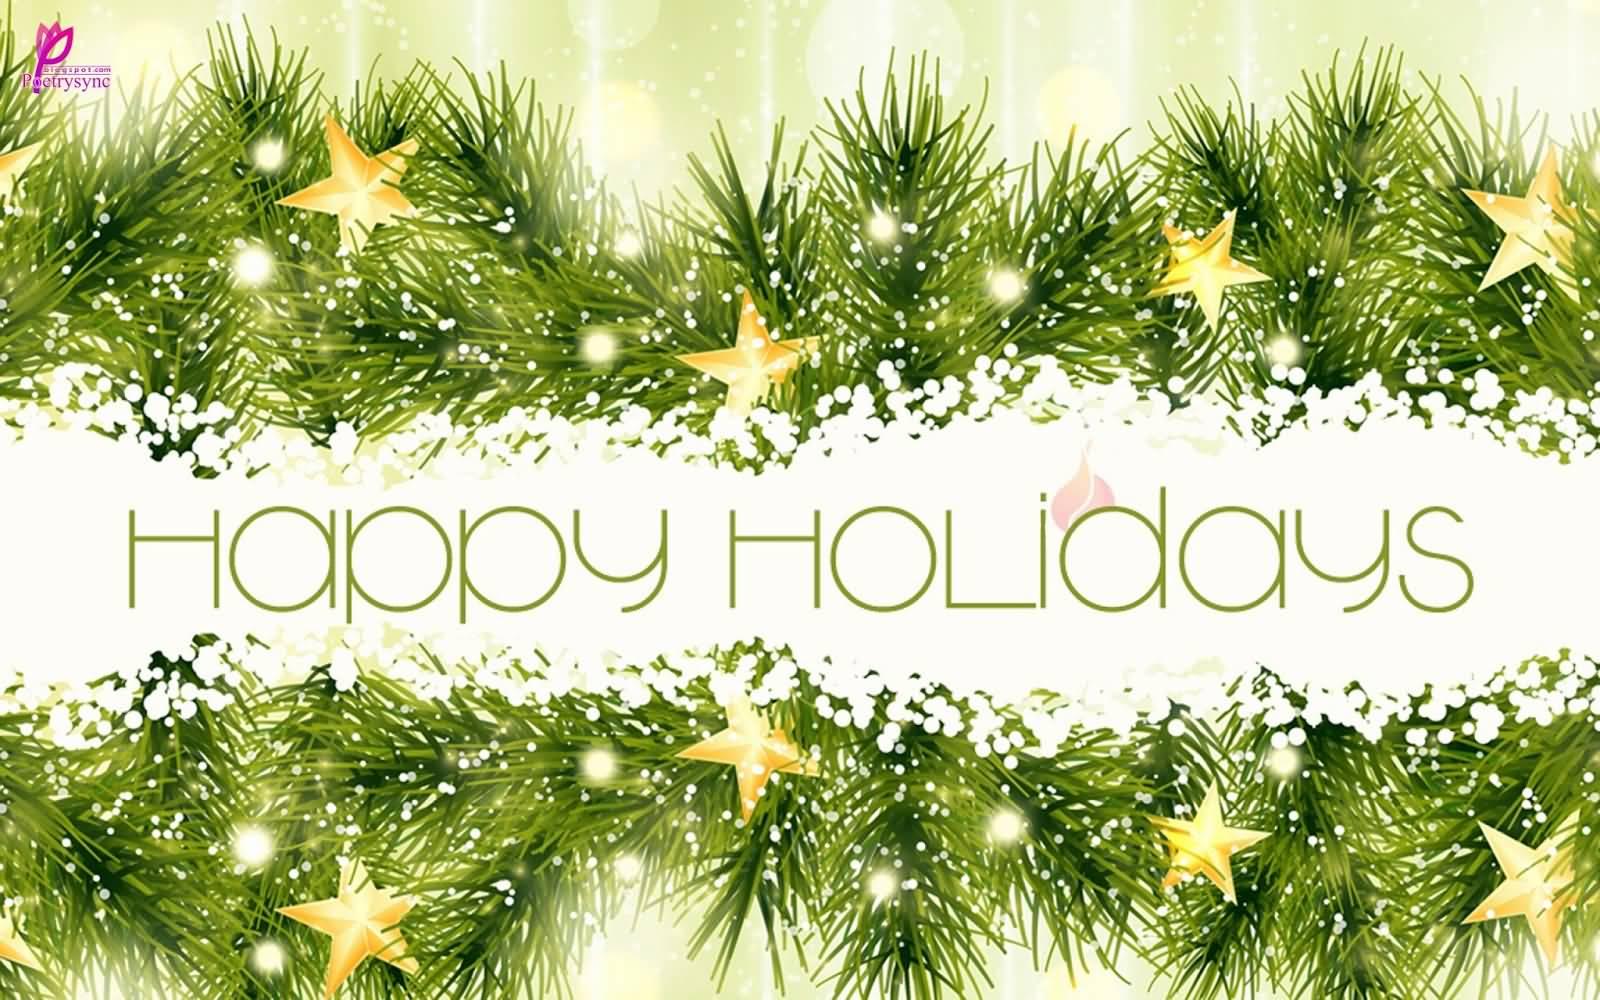 Happy Holidays beautiful wallpaper 1600x1000